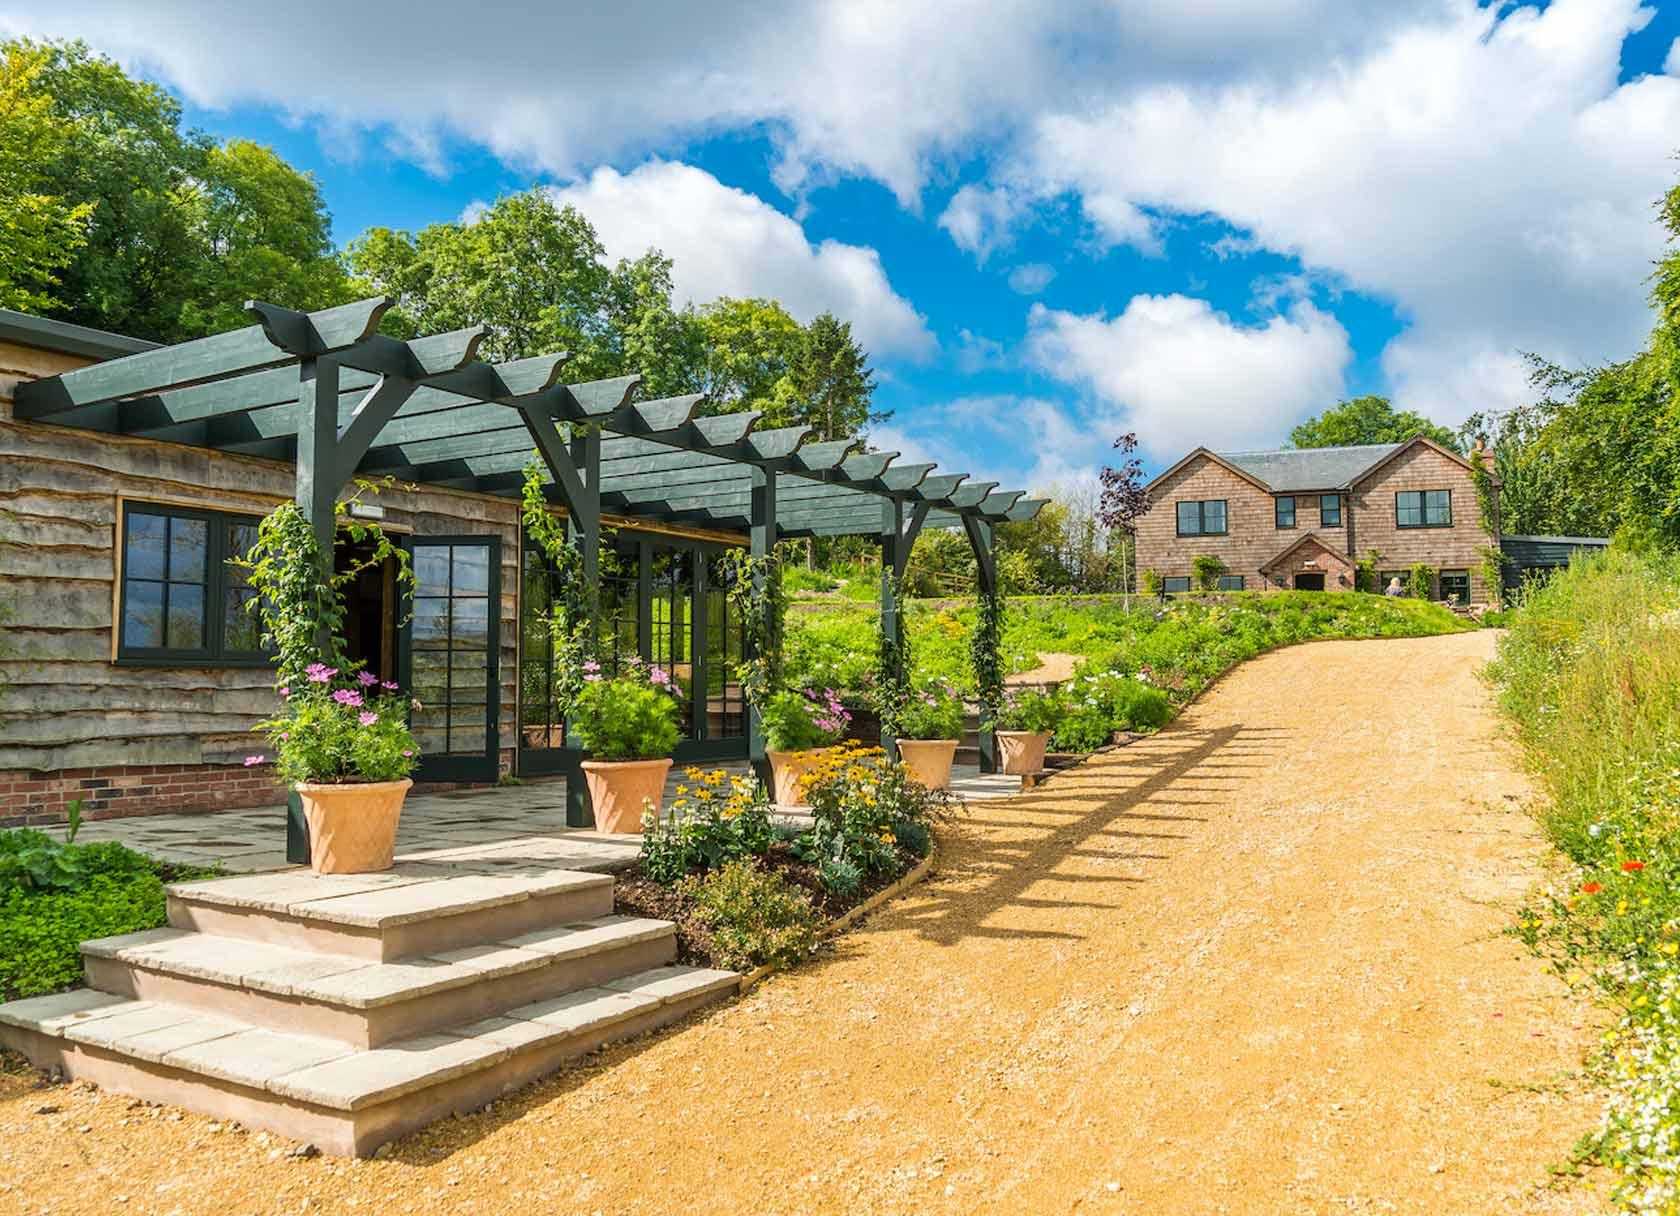 Outdoor Pergola Area Near Hillside Cottage in Edington, England